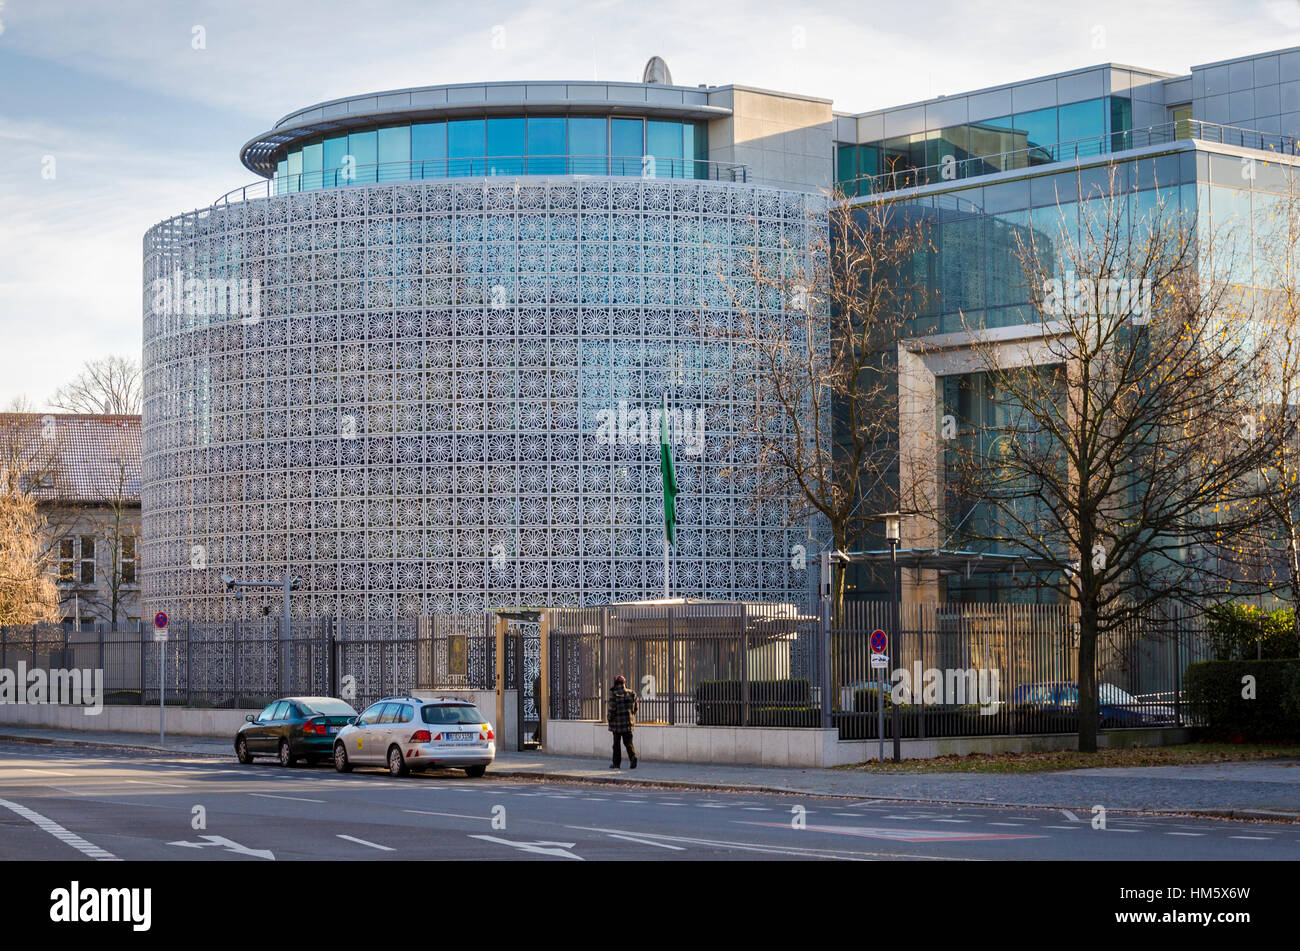 Embassy of the Kingdom of Saudi Arabia in Germany, Tiergartenstrasse, Berlin, Germany - Stock Image